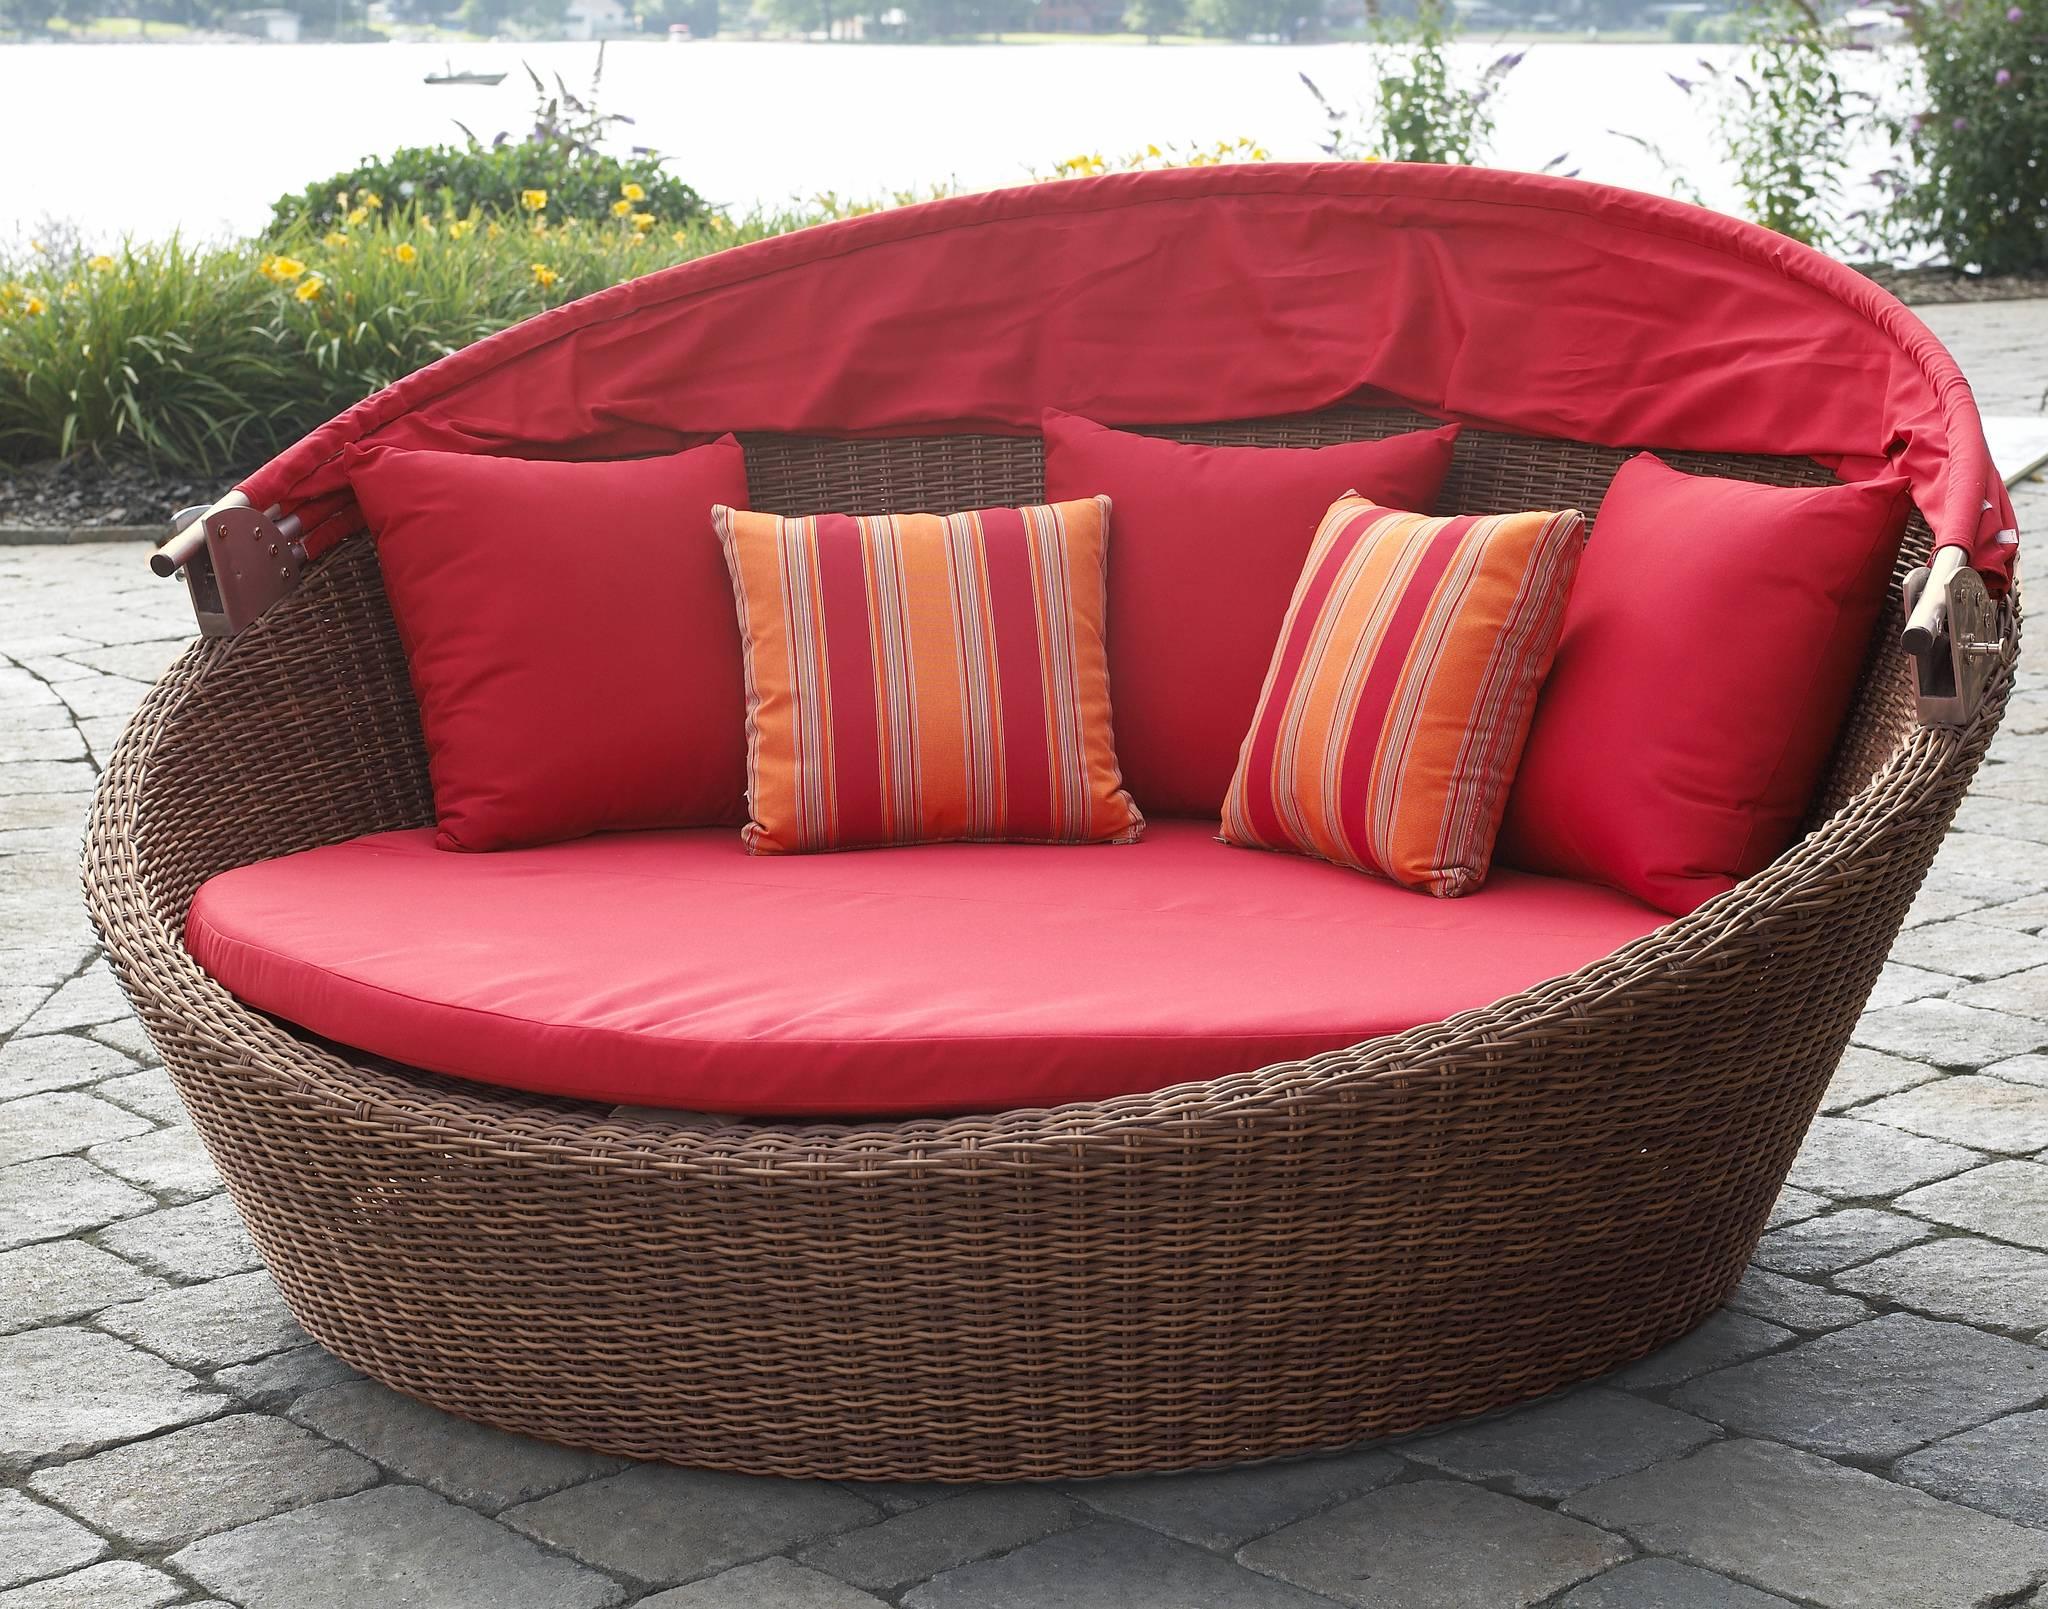 Sunbrella Cushions Make Porch Pillow Paradise